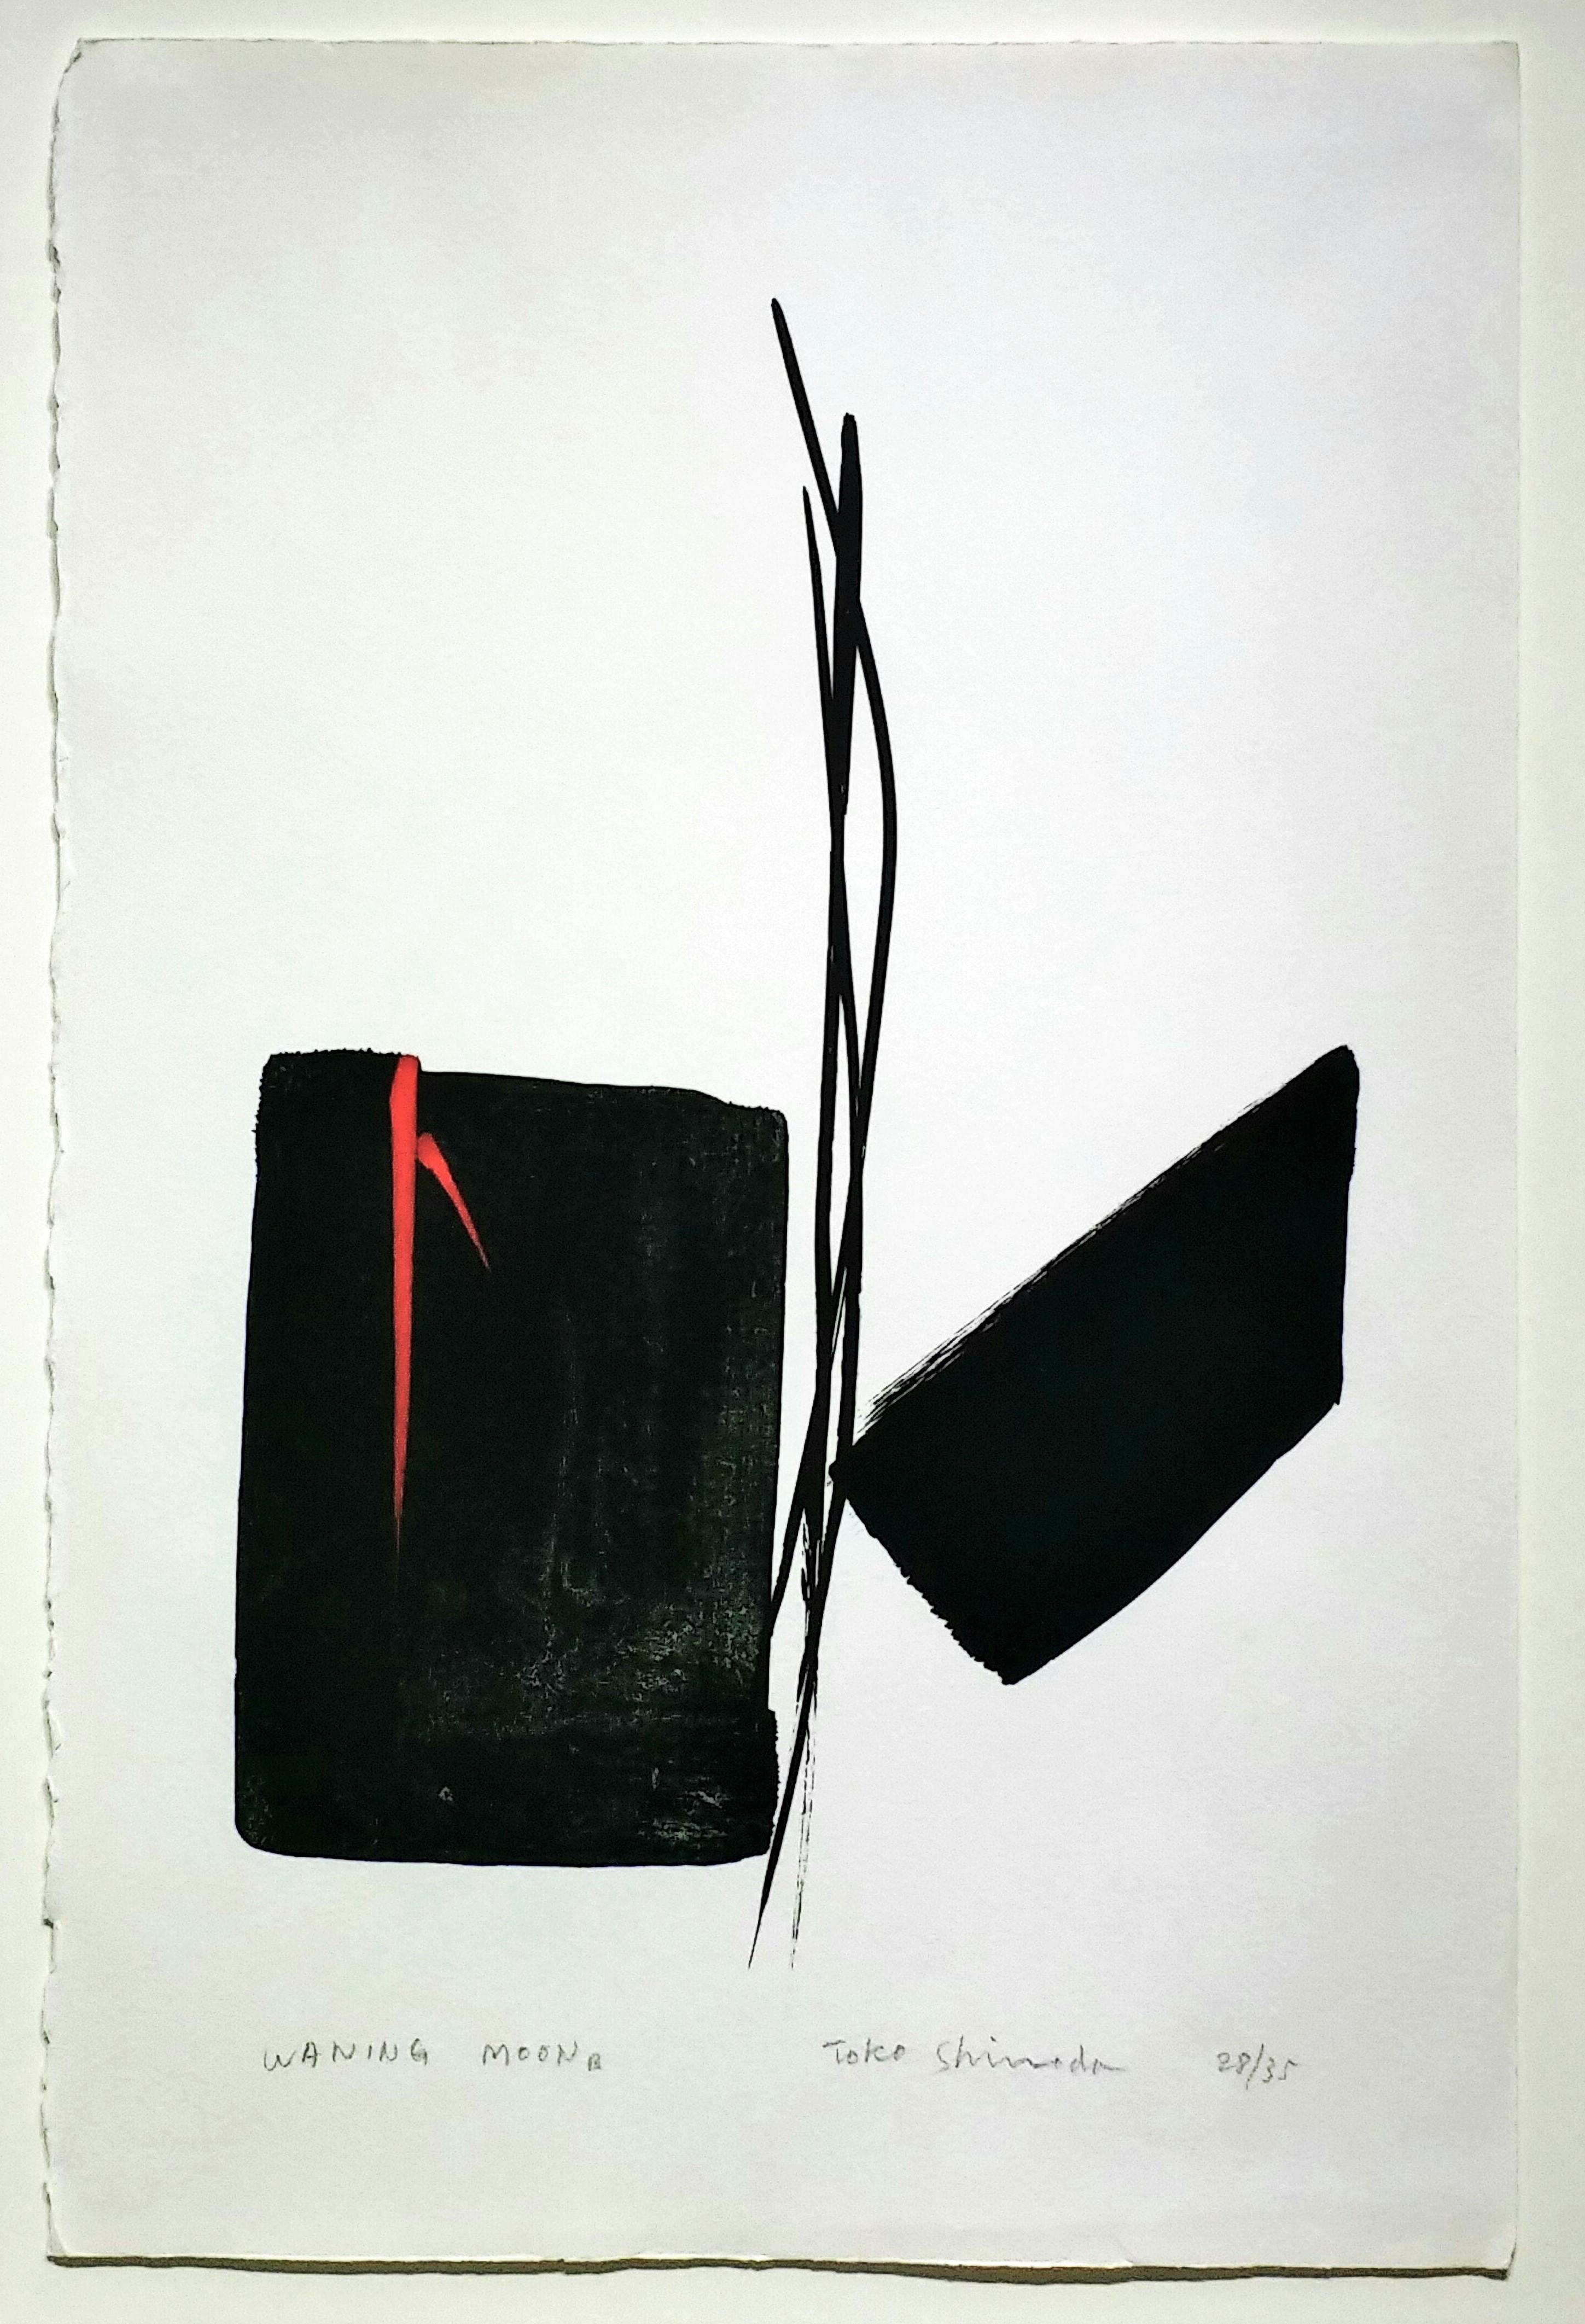 WANING-MOON」手彩色リトグラフ50.4×32.5cm1.jpg